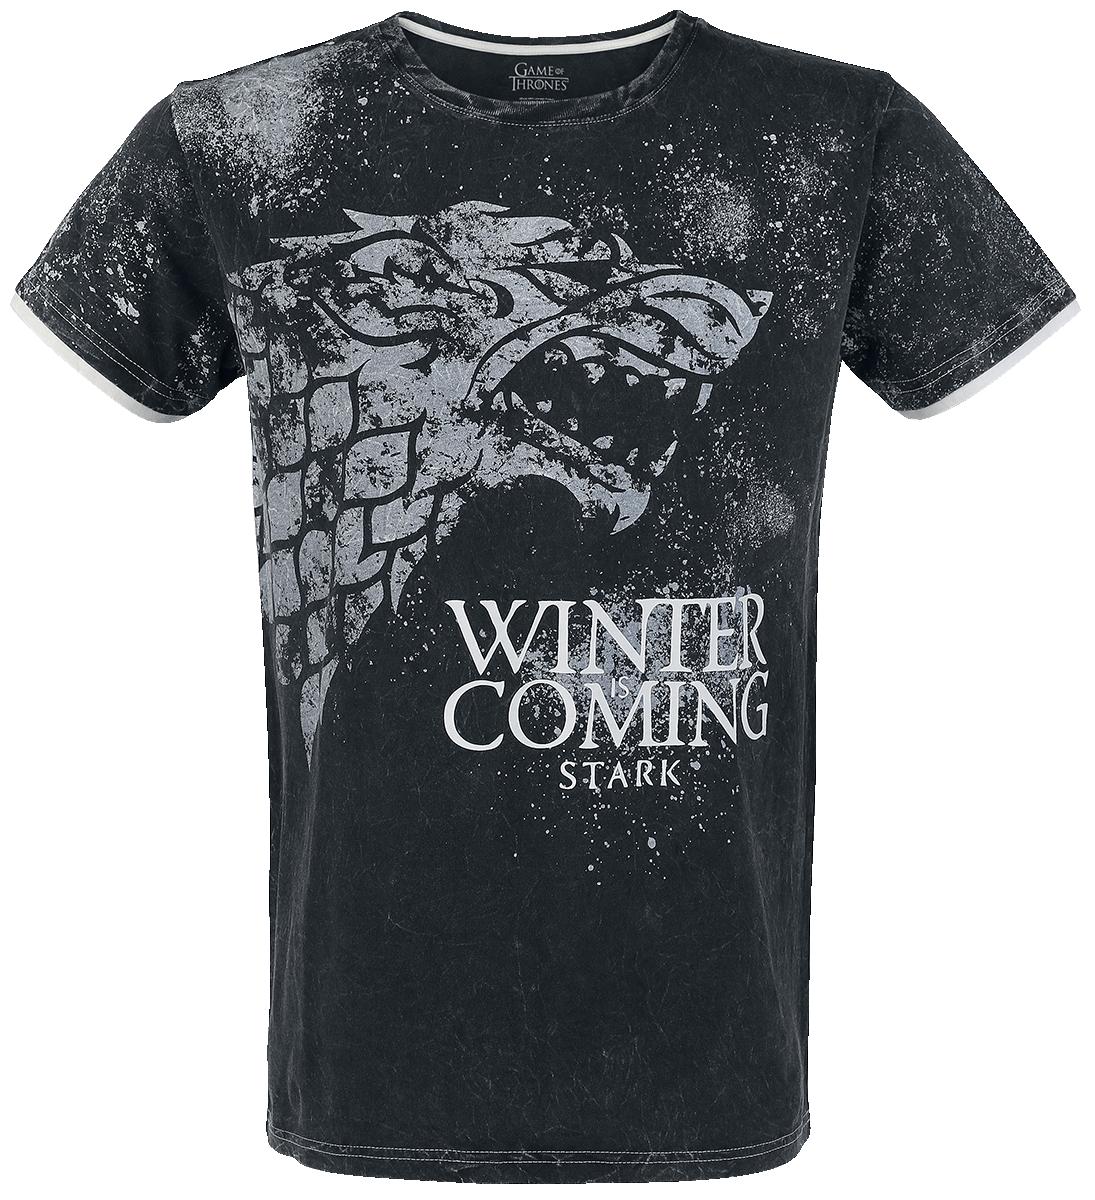 Game of Thrones - Stark - Winter Is Coming - T-Shirt - dark grey image